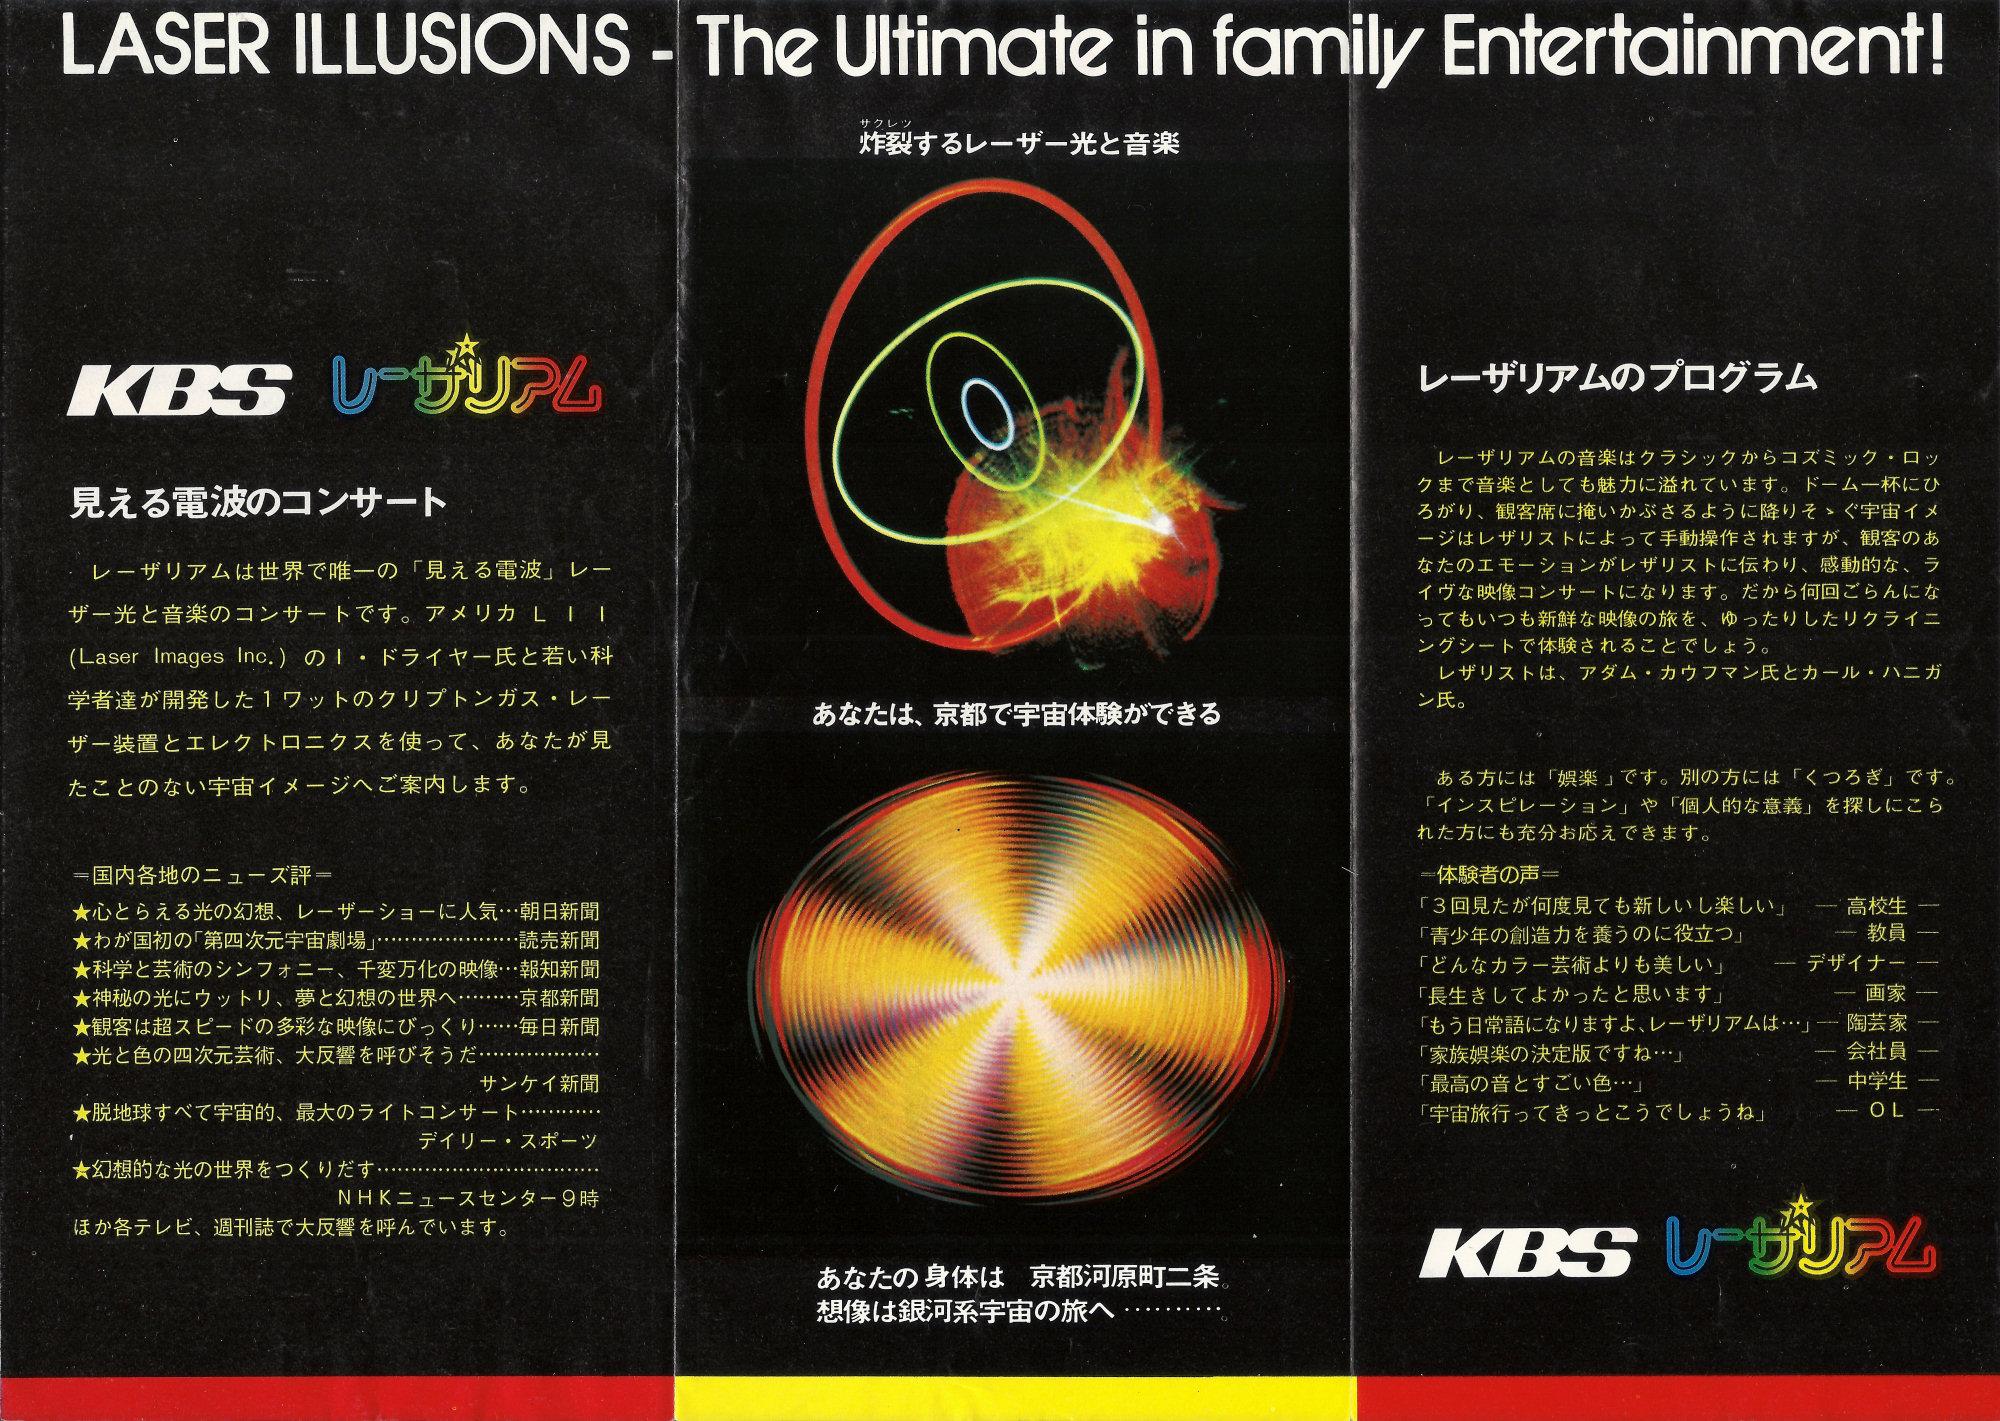 http://tokyosky.to/tokyosky_webmasters_blog/2014/03/01/blogimage/laseriun_pamphlet76_2.jpg